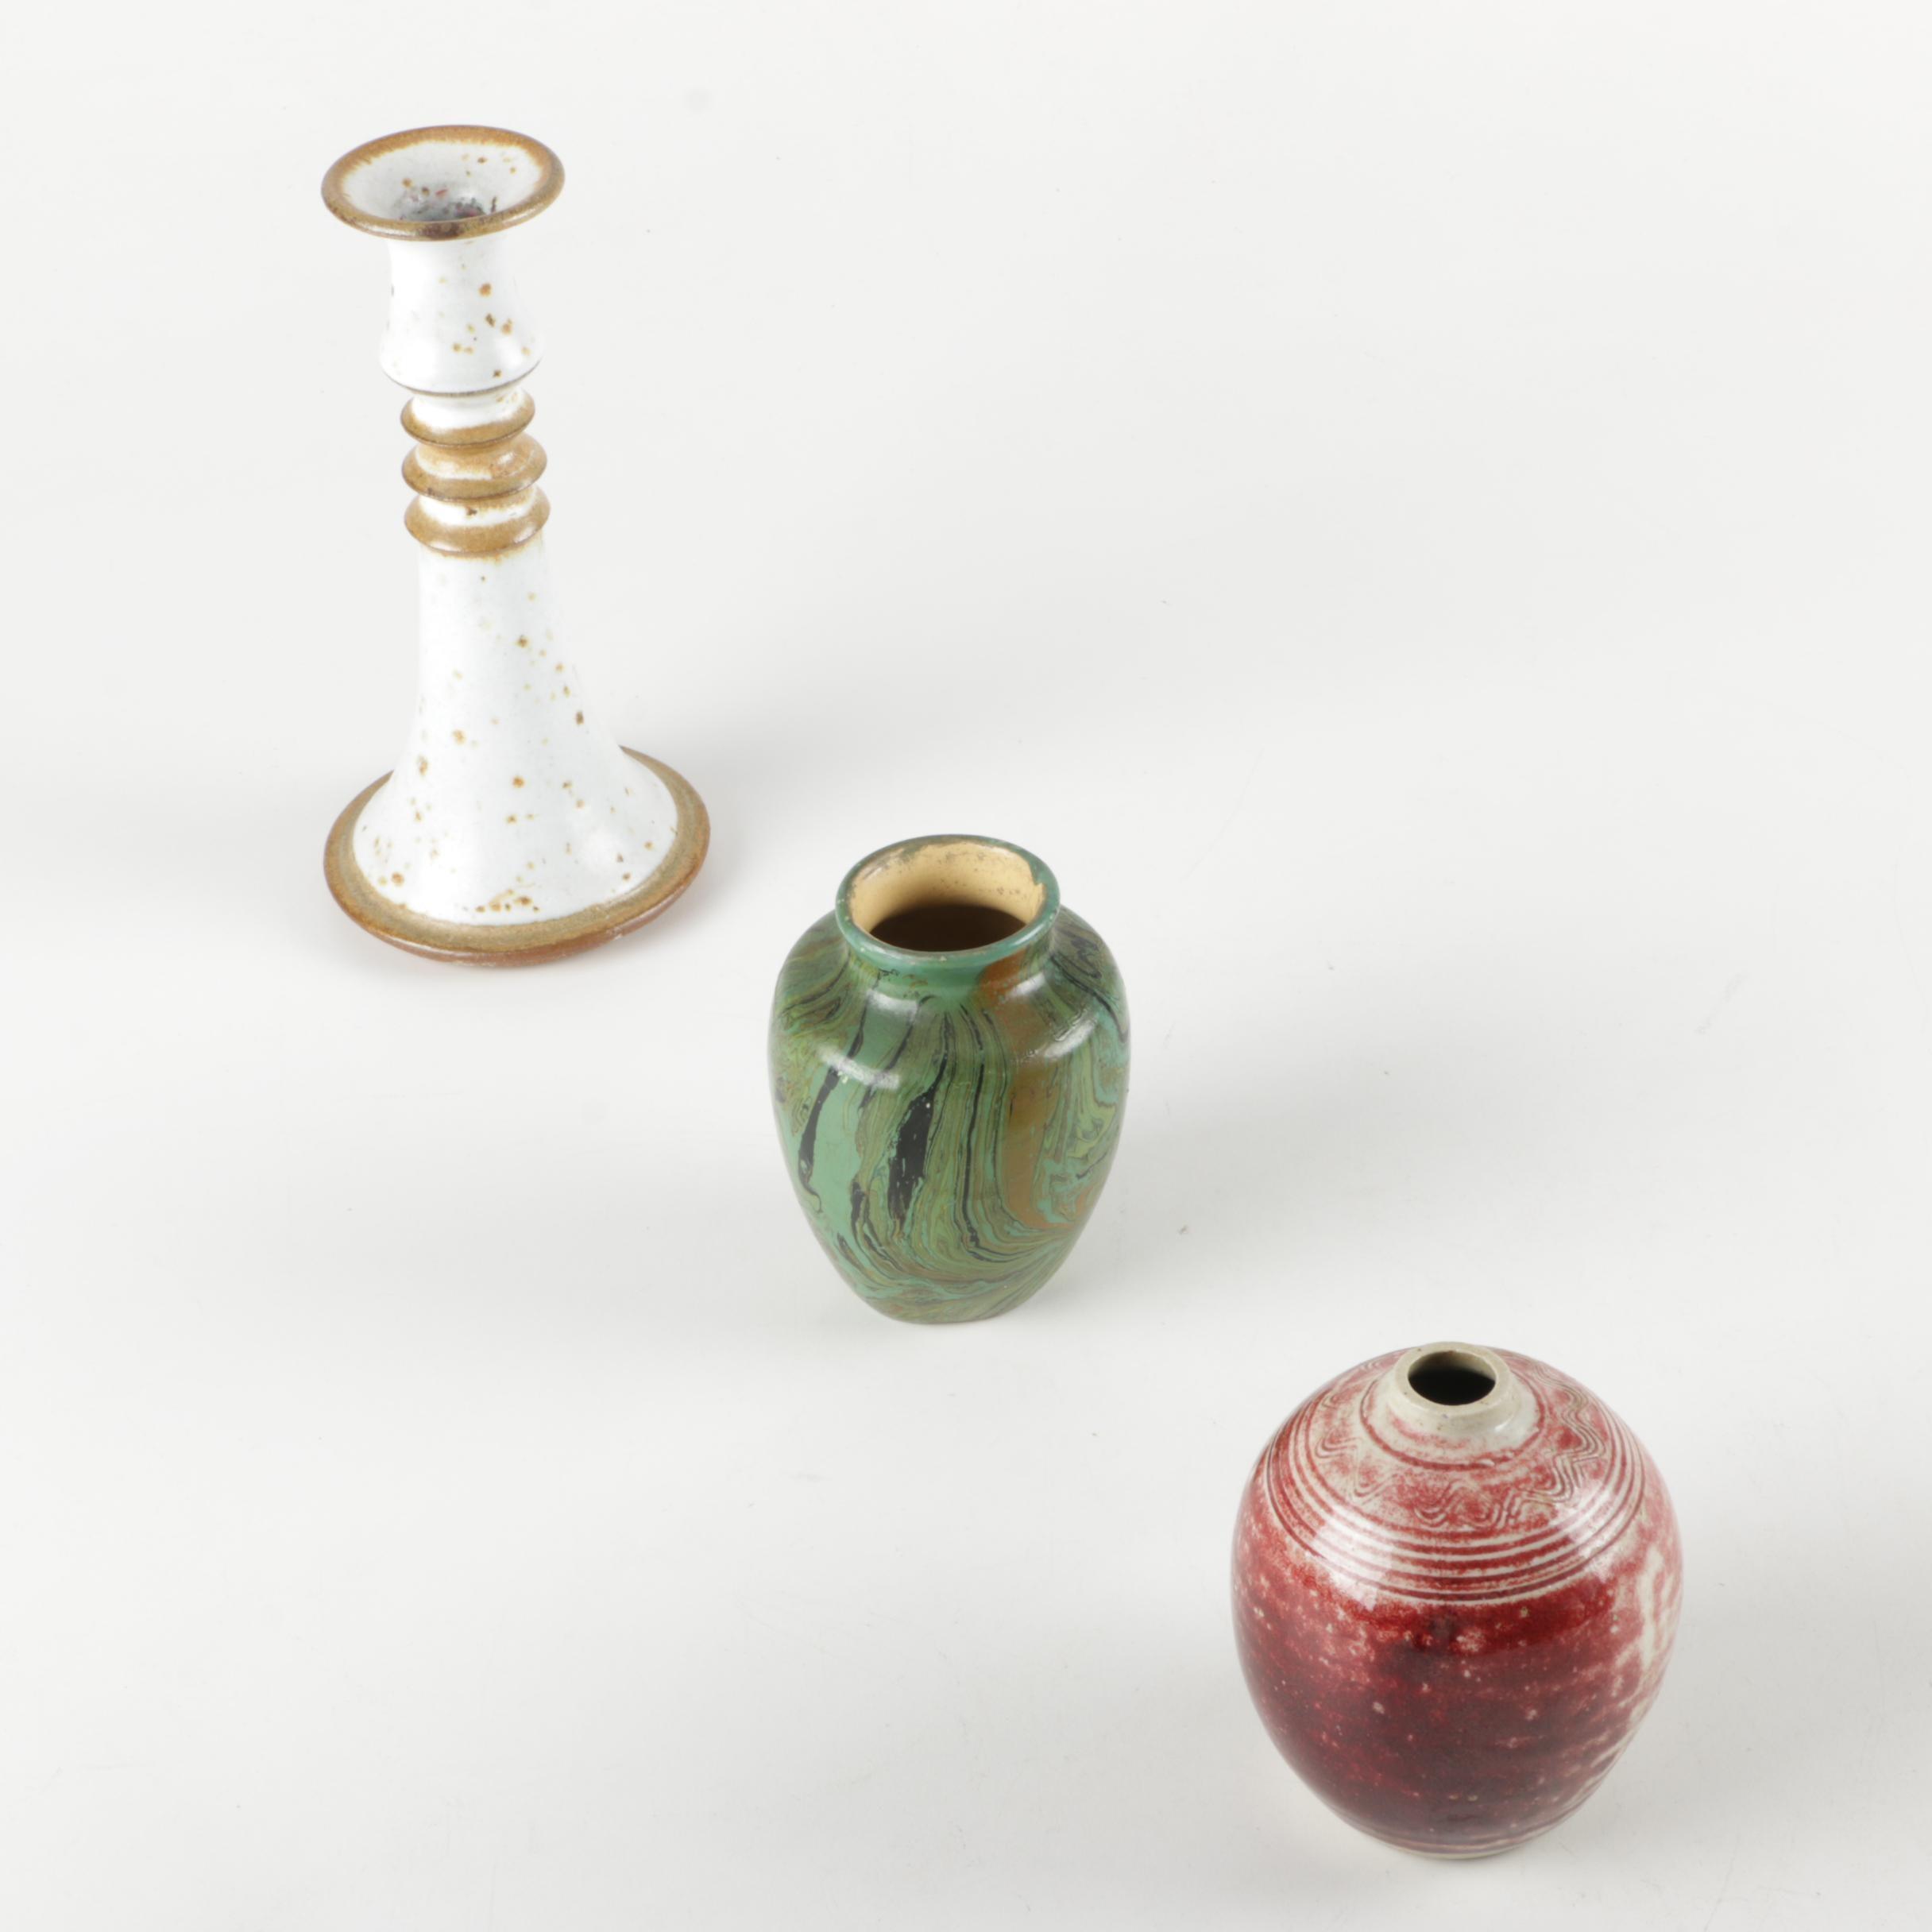 Vintage Studio Pottery Featuring Marbled Vase